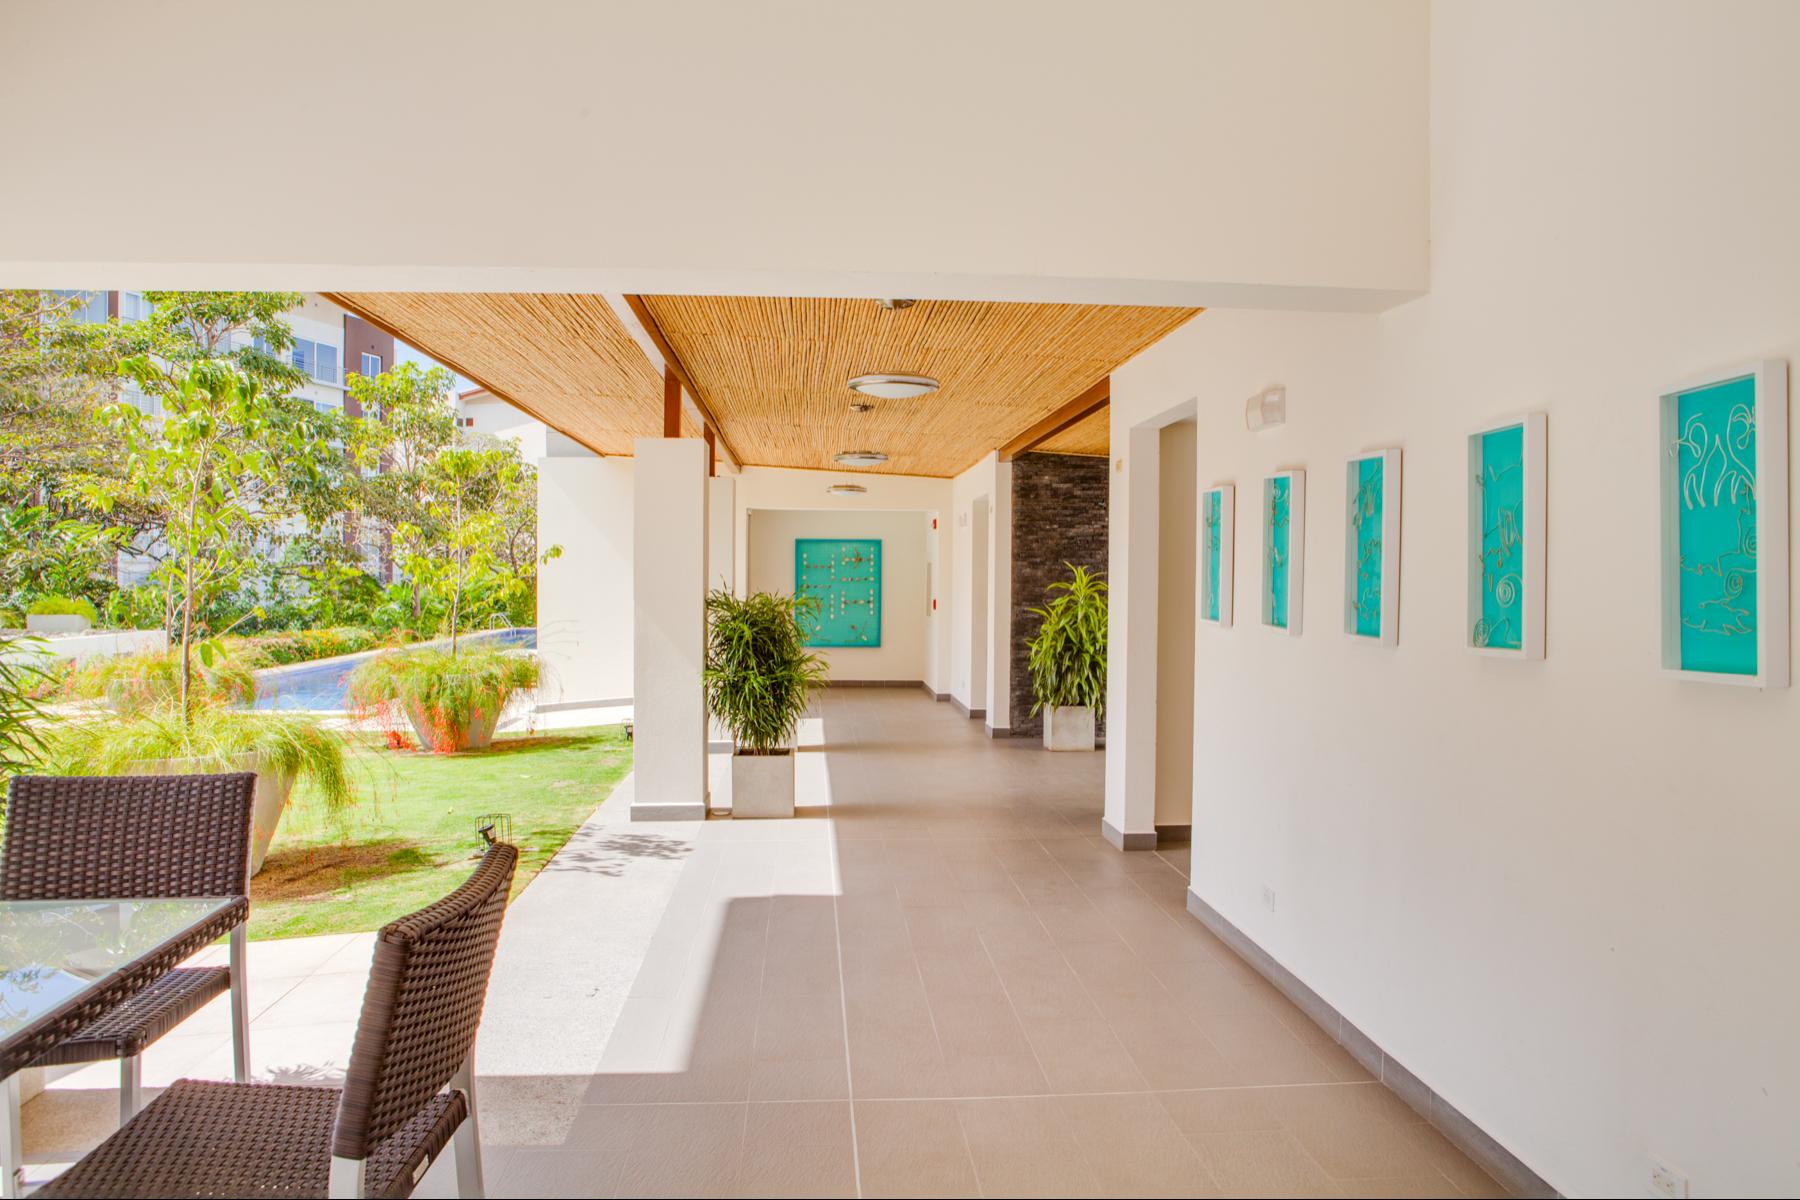 Additional photo for property listing at Guachipelin Escazu Penthouse  Escazu, San Jose 10203 Costa Rica